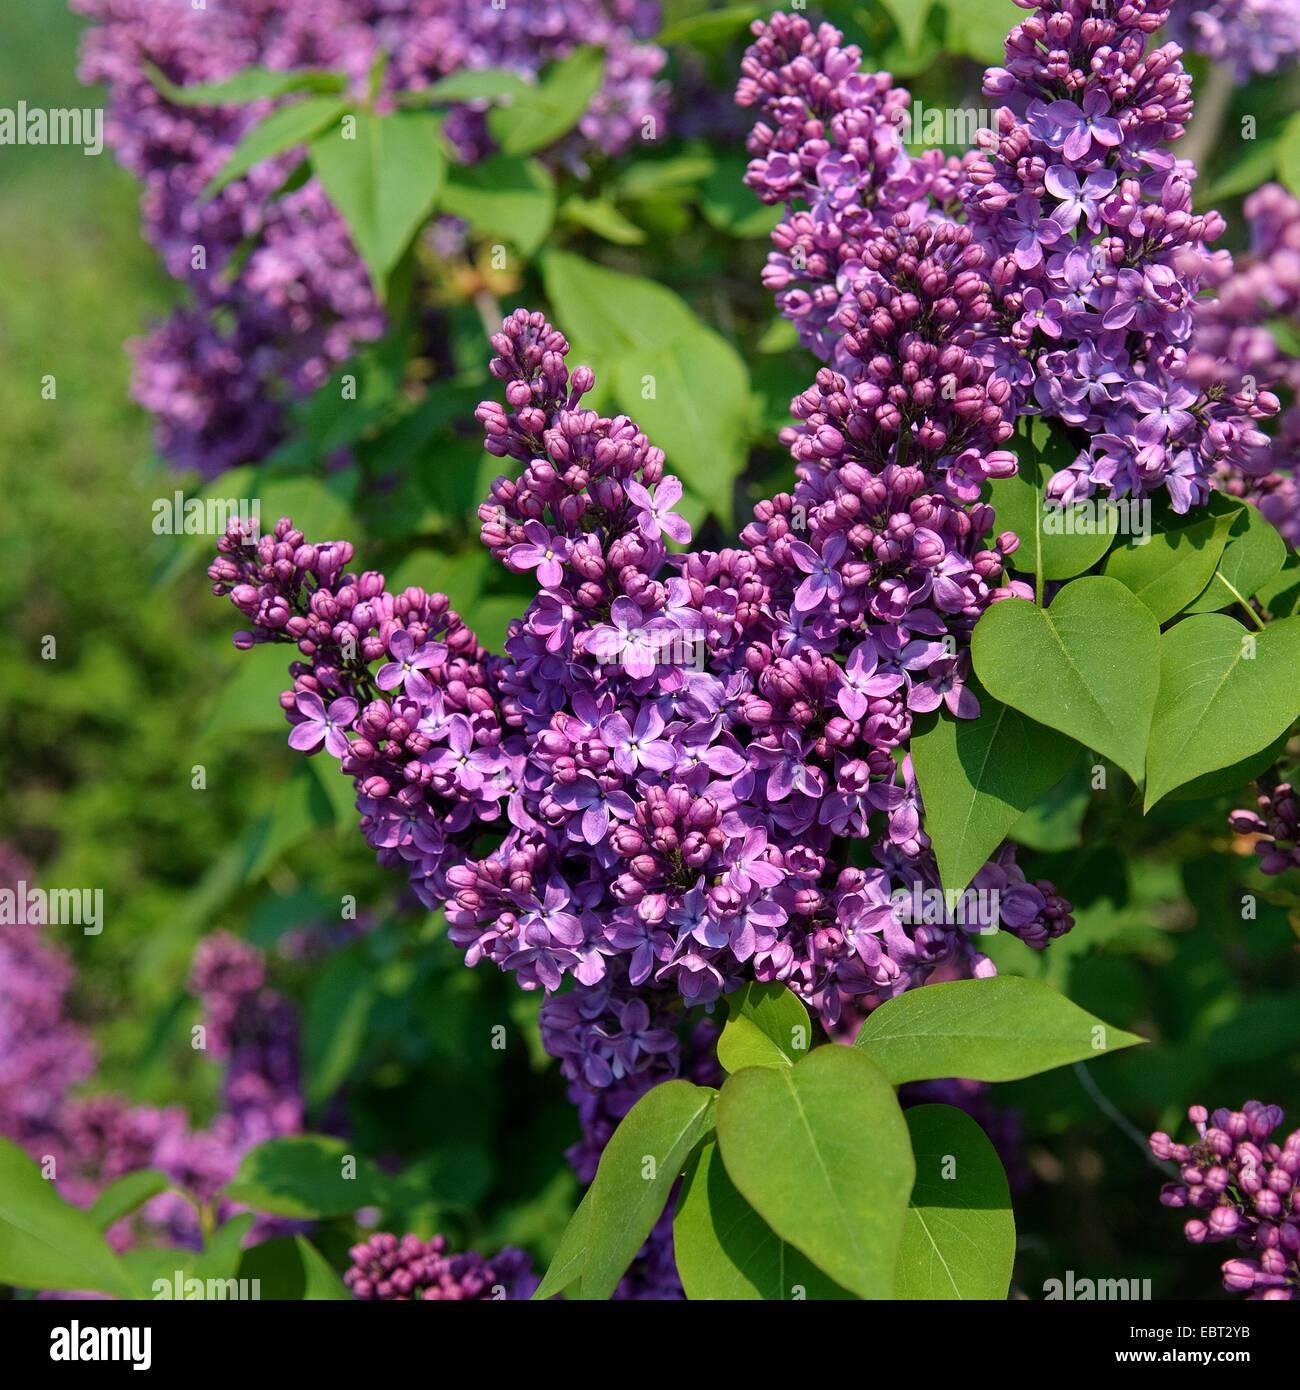 common lilac syringa vulgaris 39 ruhm von horstenstein 39 syringa stock photo 76131871 alamy. Black Bedroom Furniture Sets. Home Design Ideas